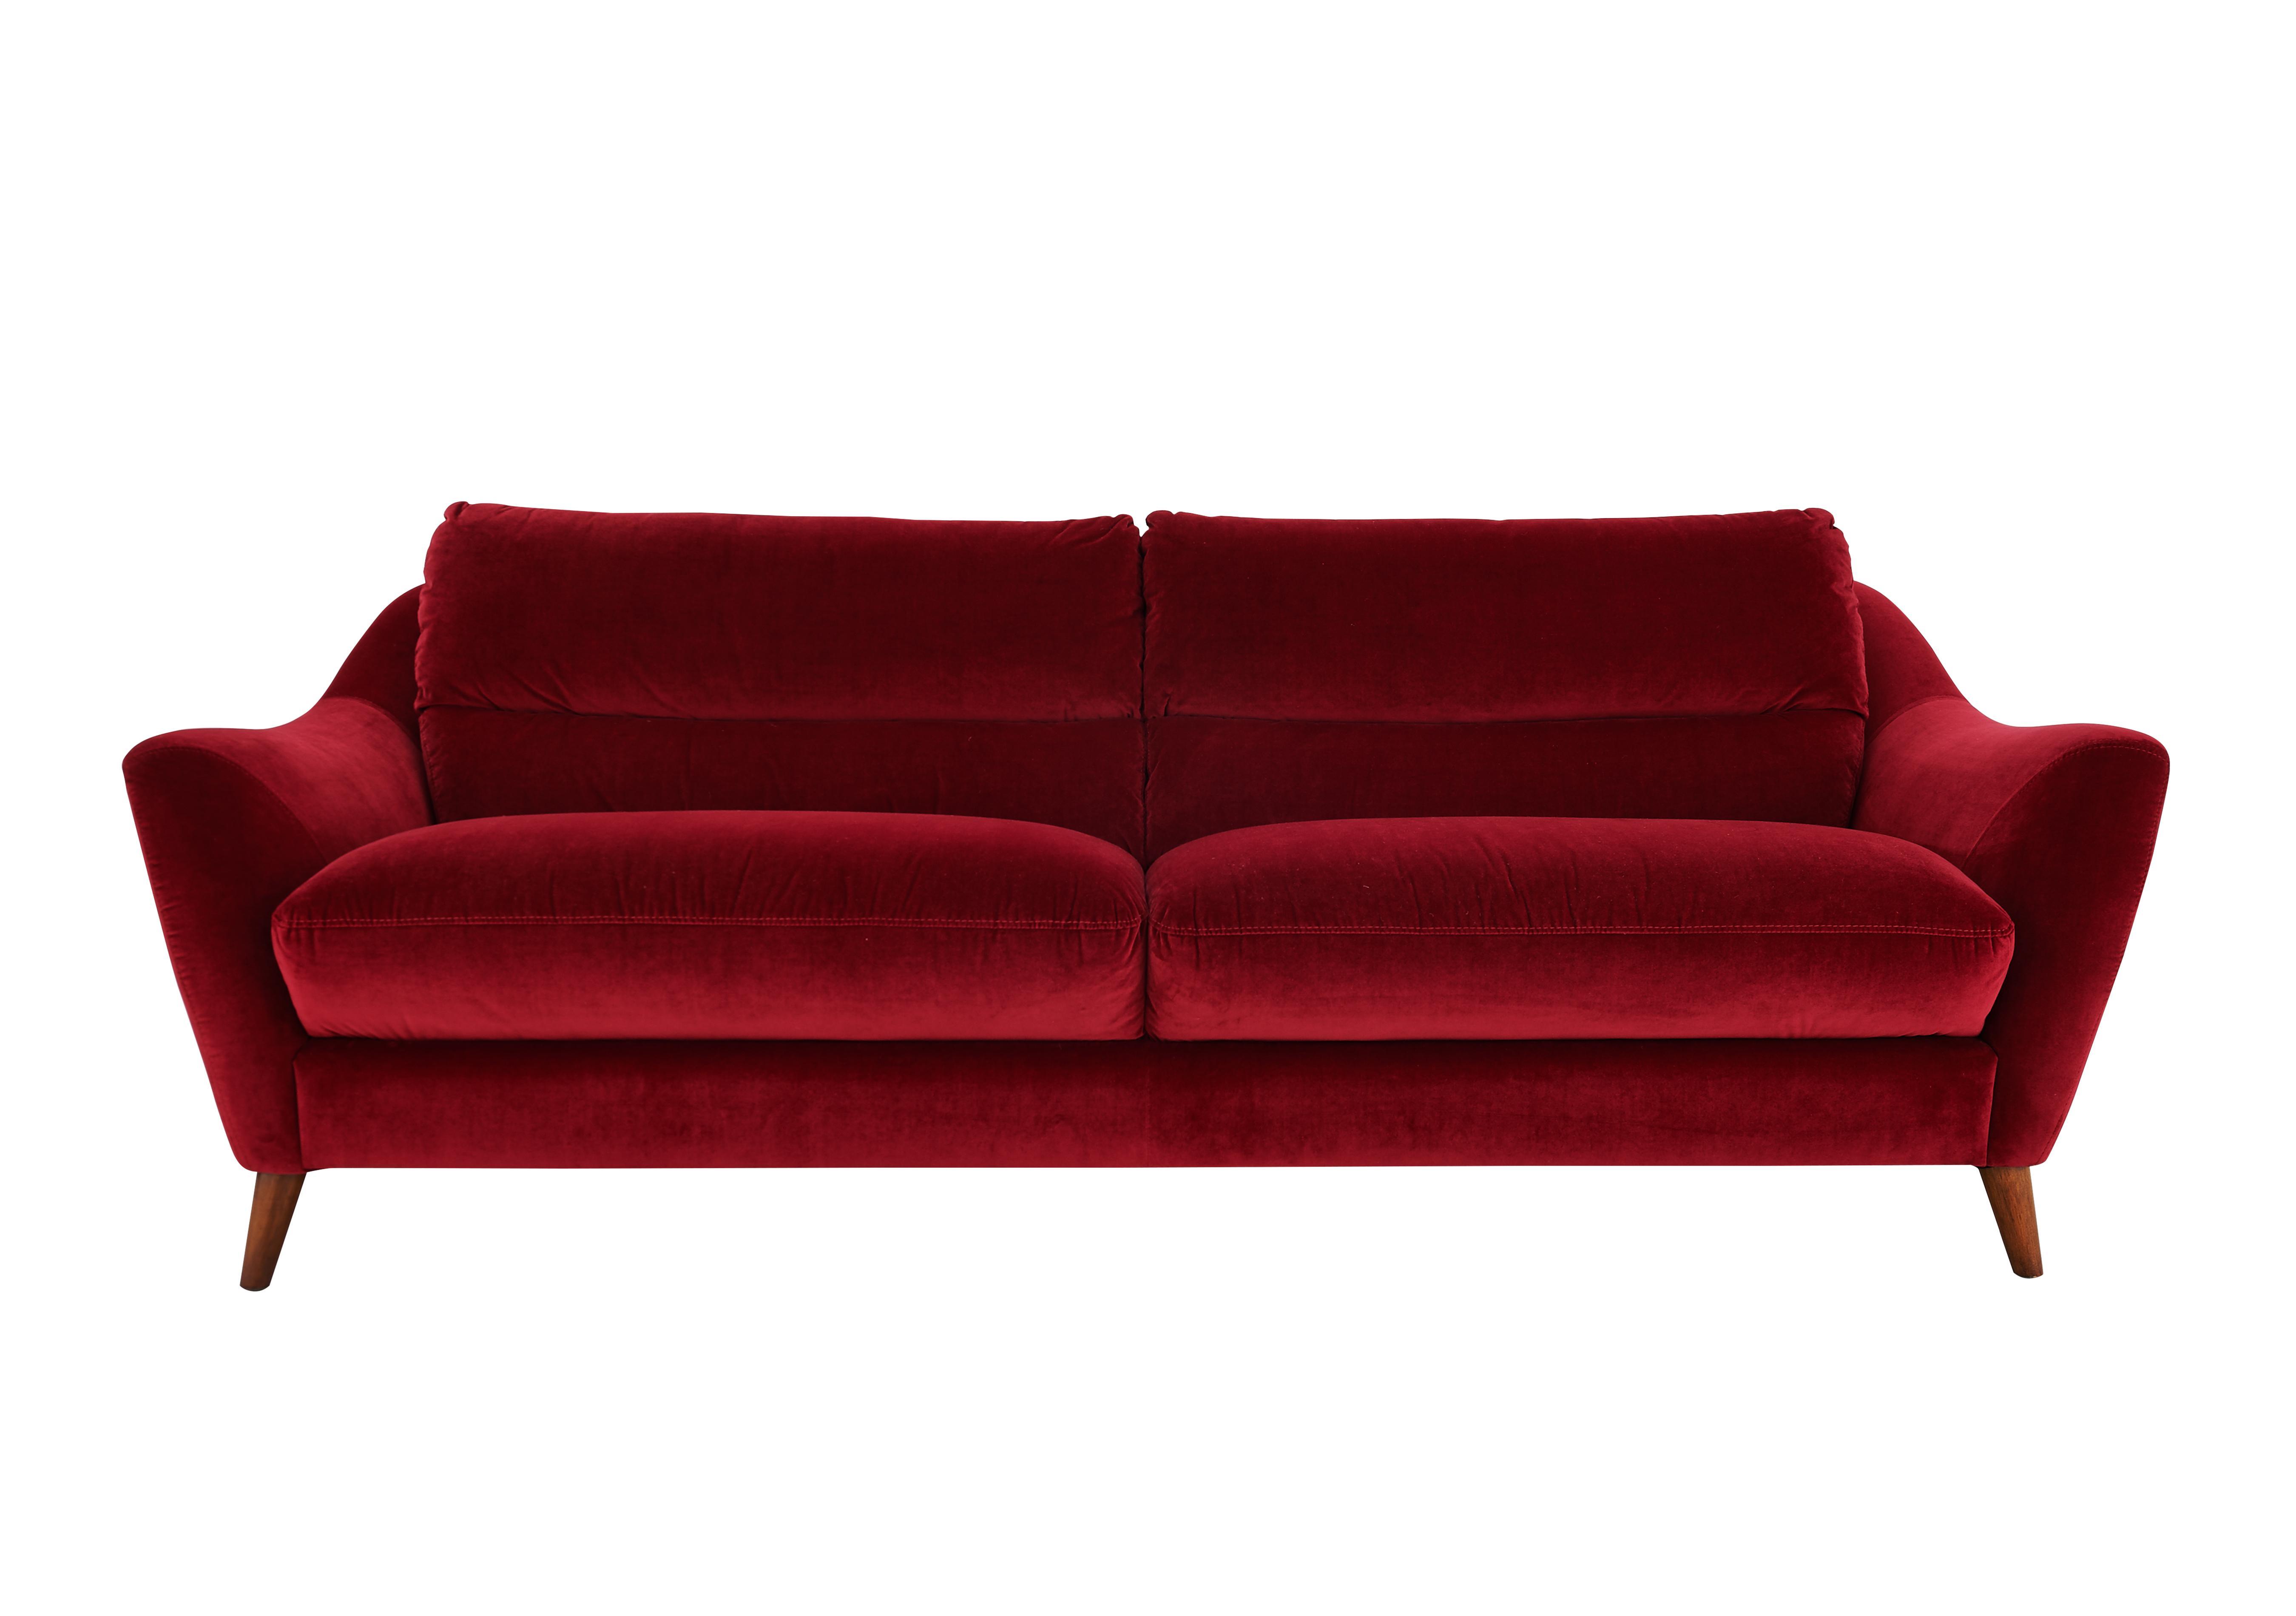 contemporary sofa your recently viewed UGYUKFH